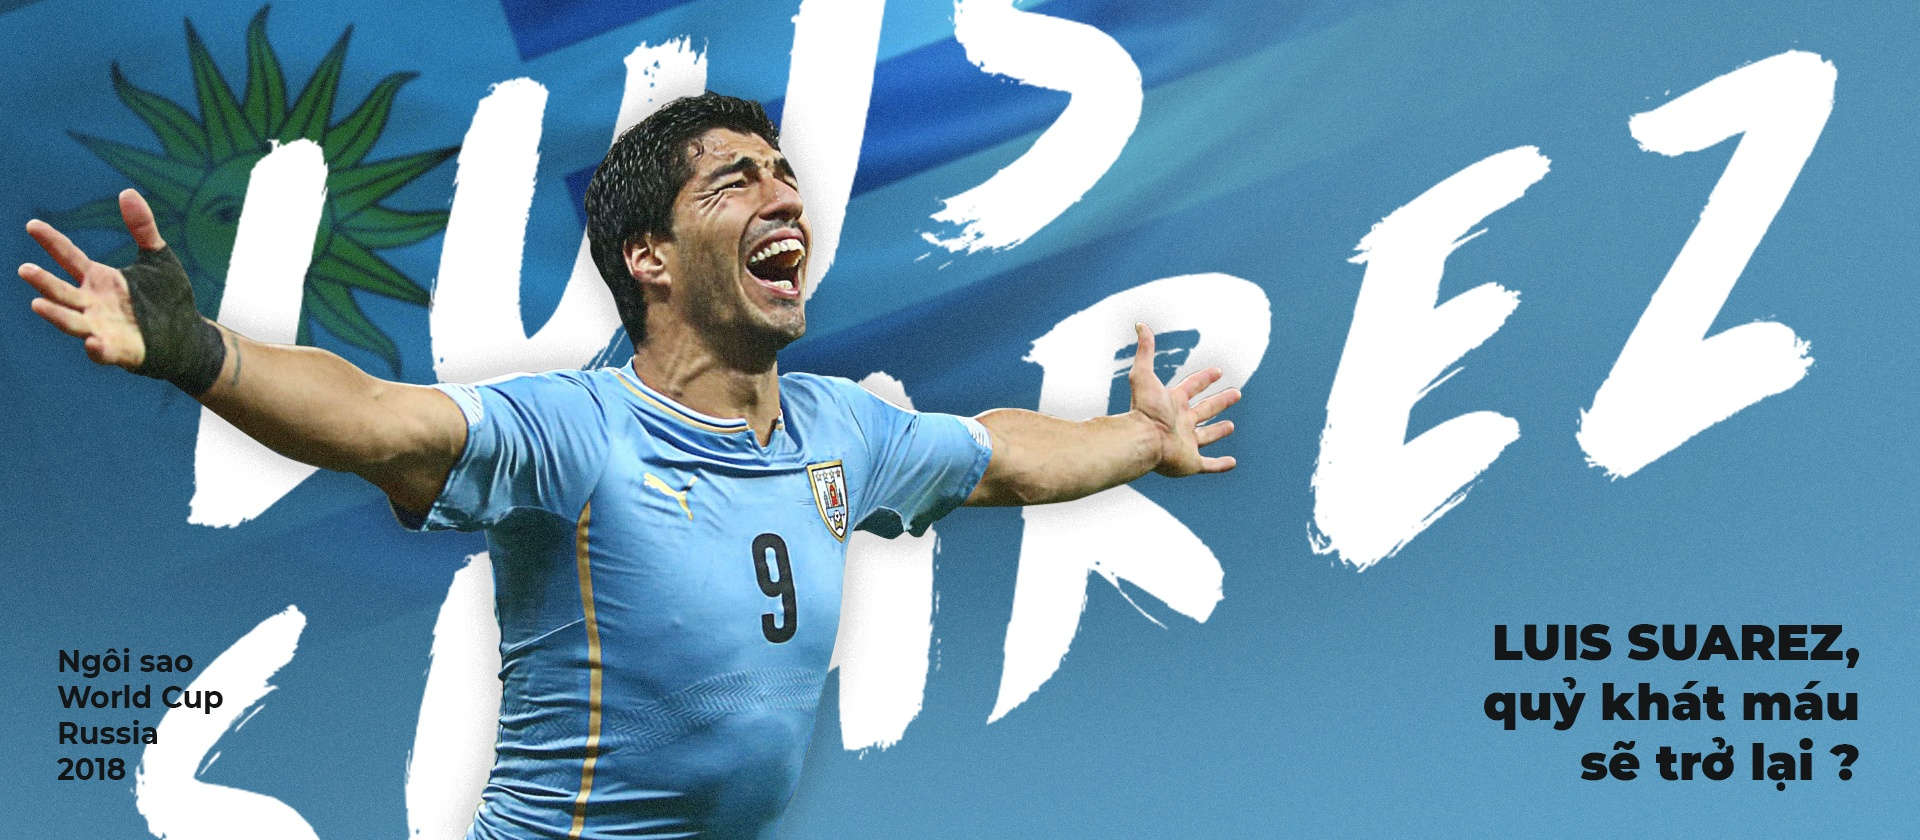 Bo mat nao cho Luis Suarez o World Cup 2018 anh 2